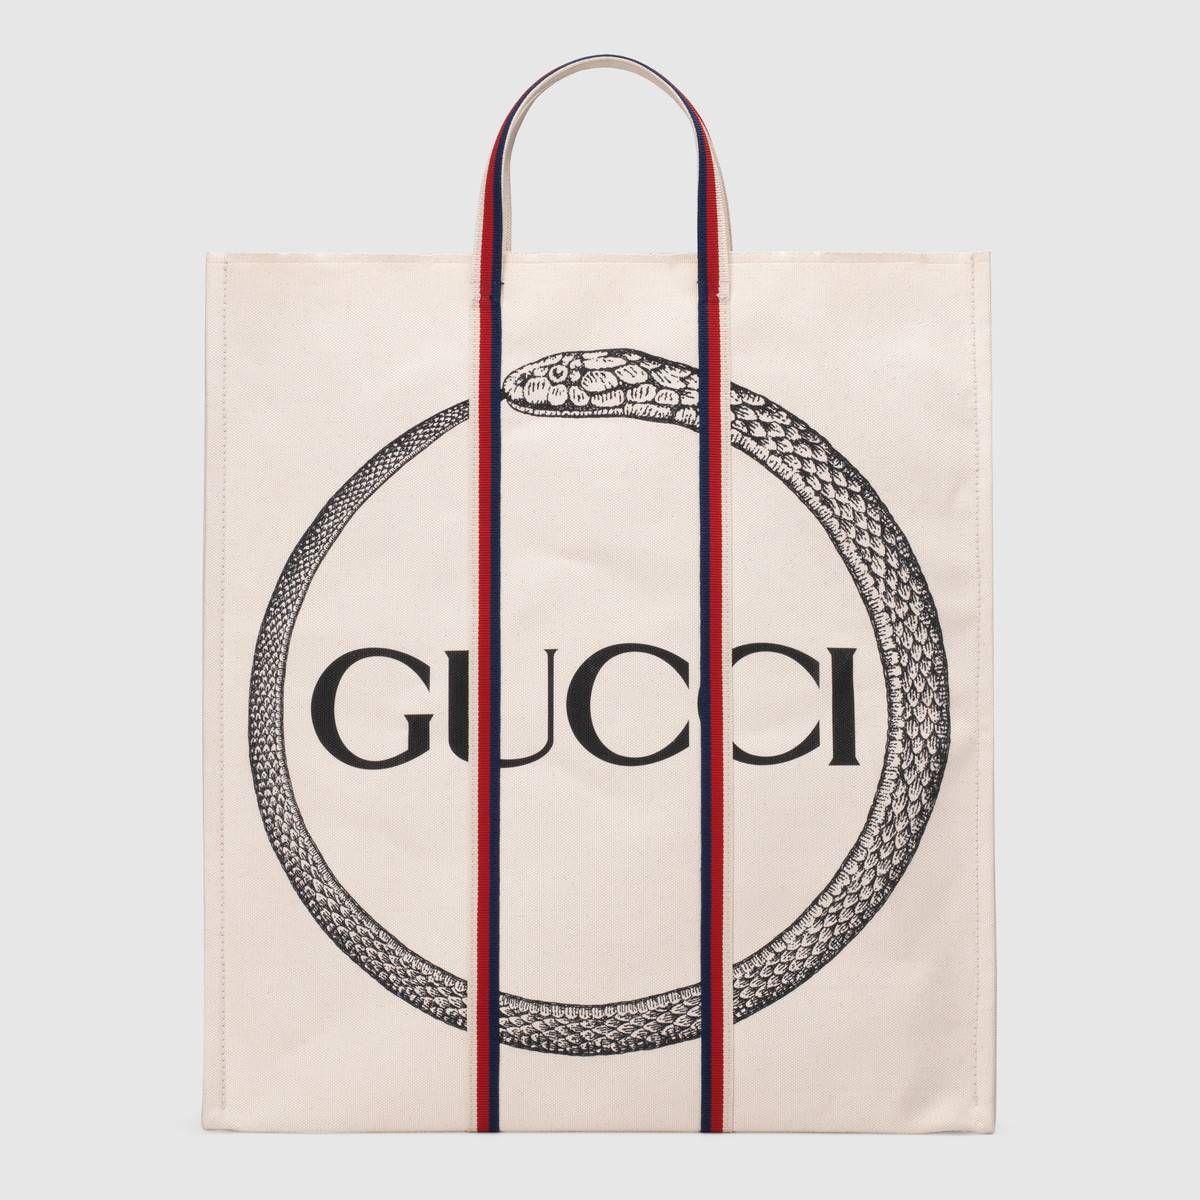 43081c2afa7 Shop the Gucci ouroboros print tote by Gucci. The canvas tote features an ouroboros  print